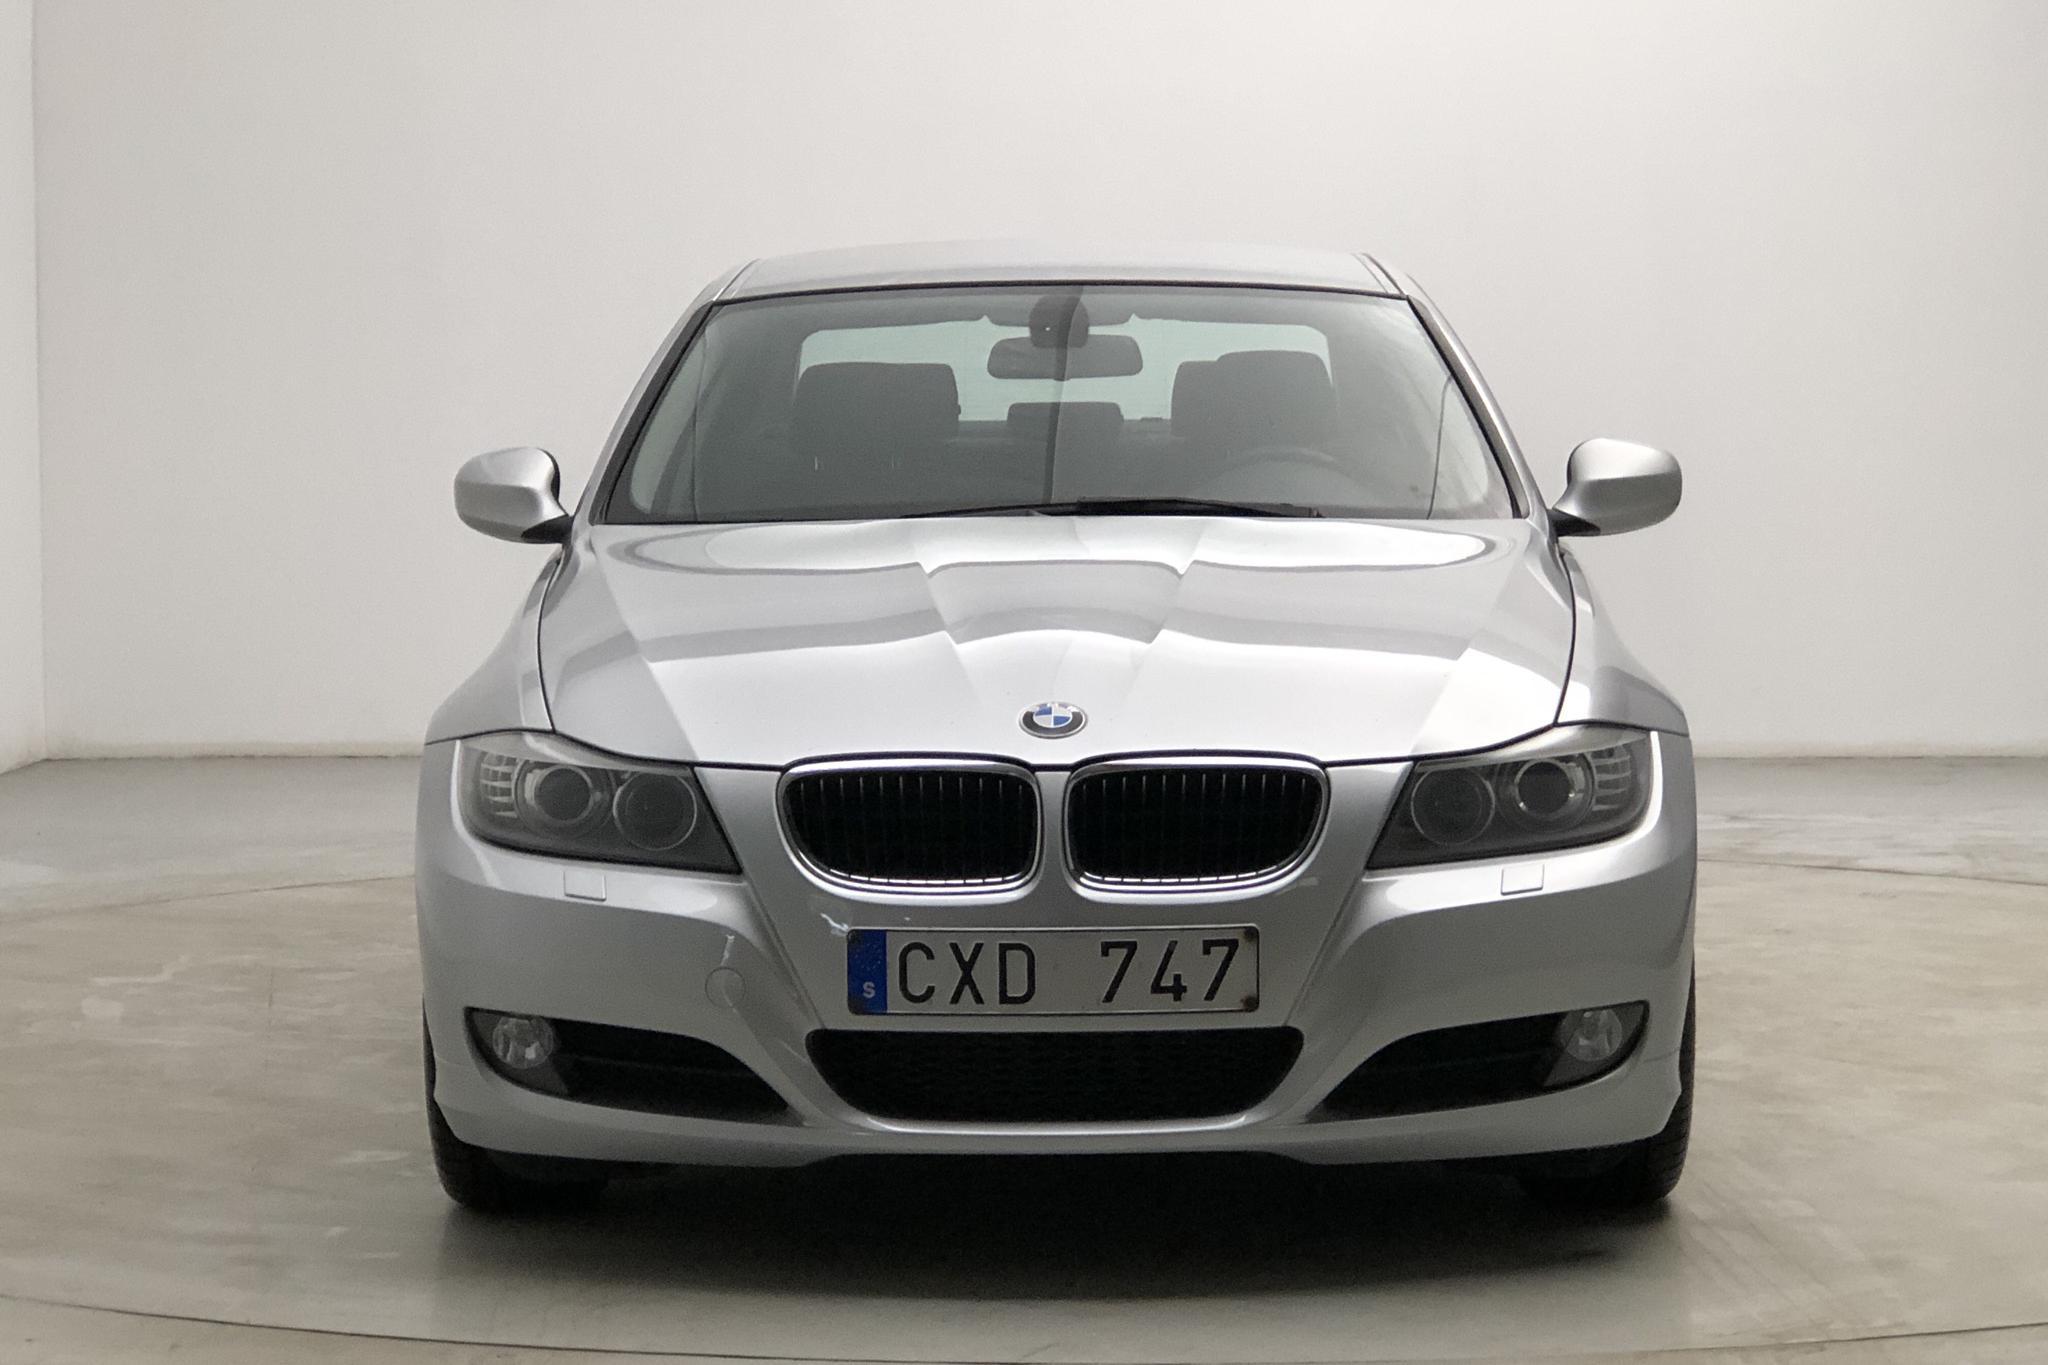 BMW 320d Sedan EfficientDynamics, E90 (163hk) - 122 070 km - Manual - silver - 2010